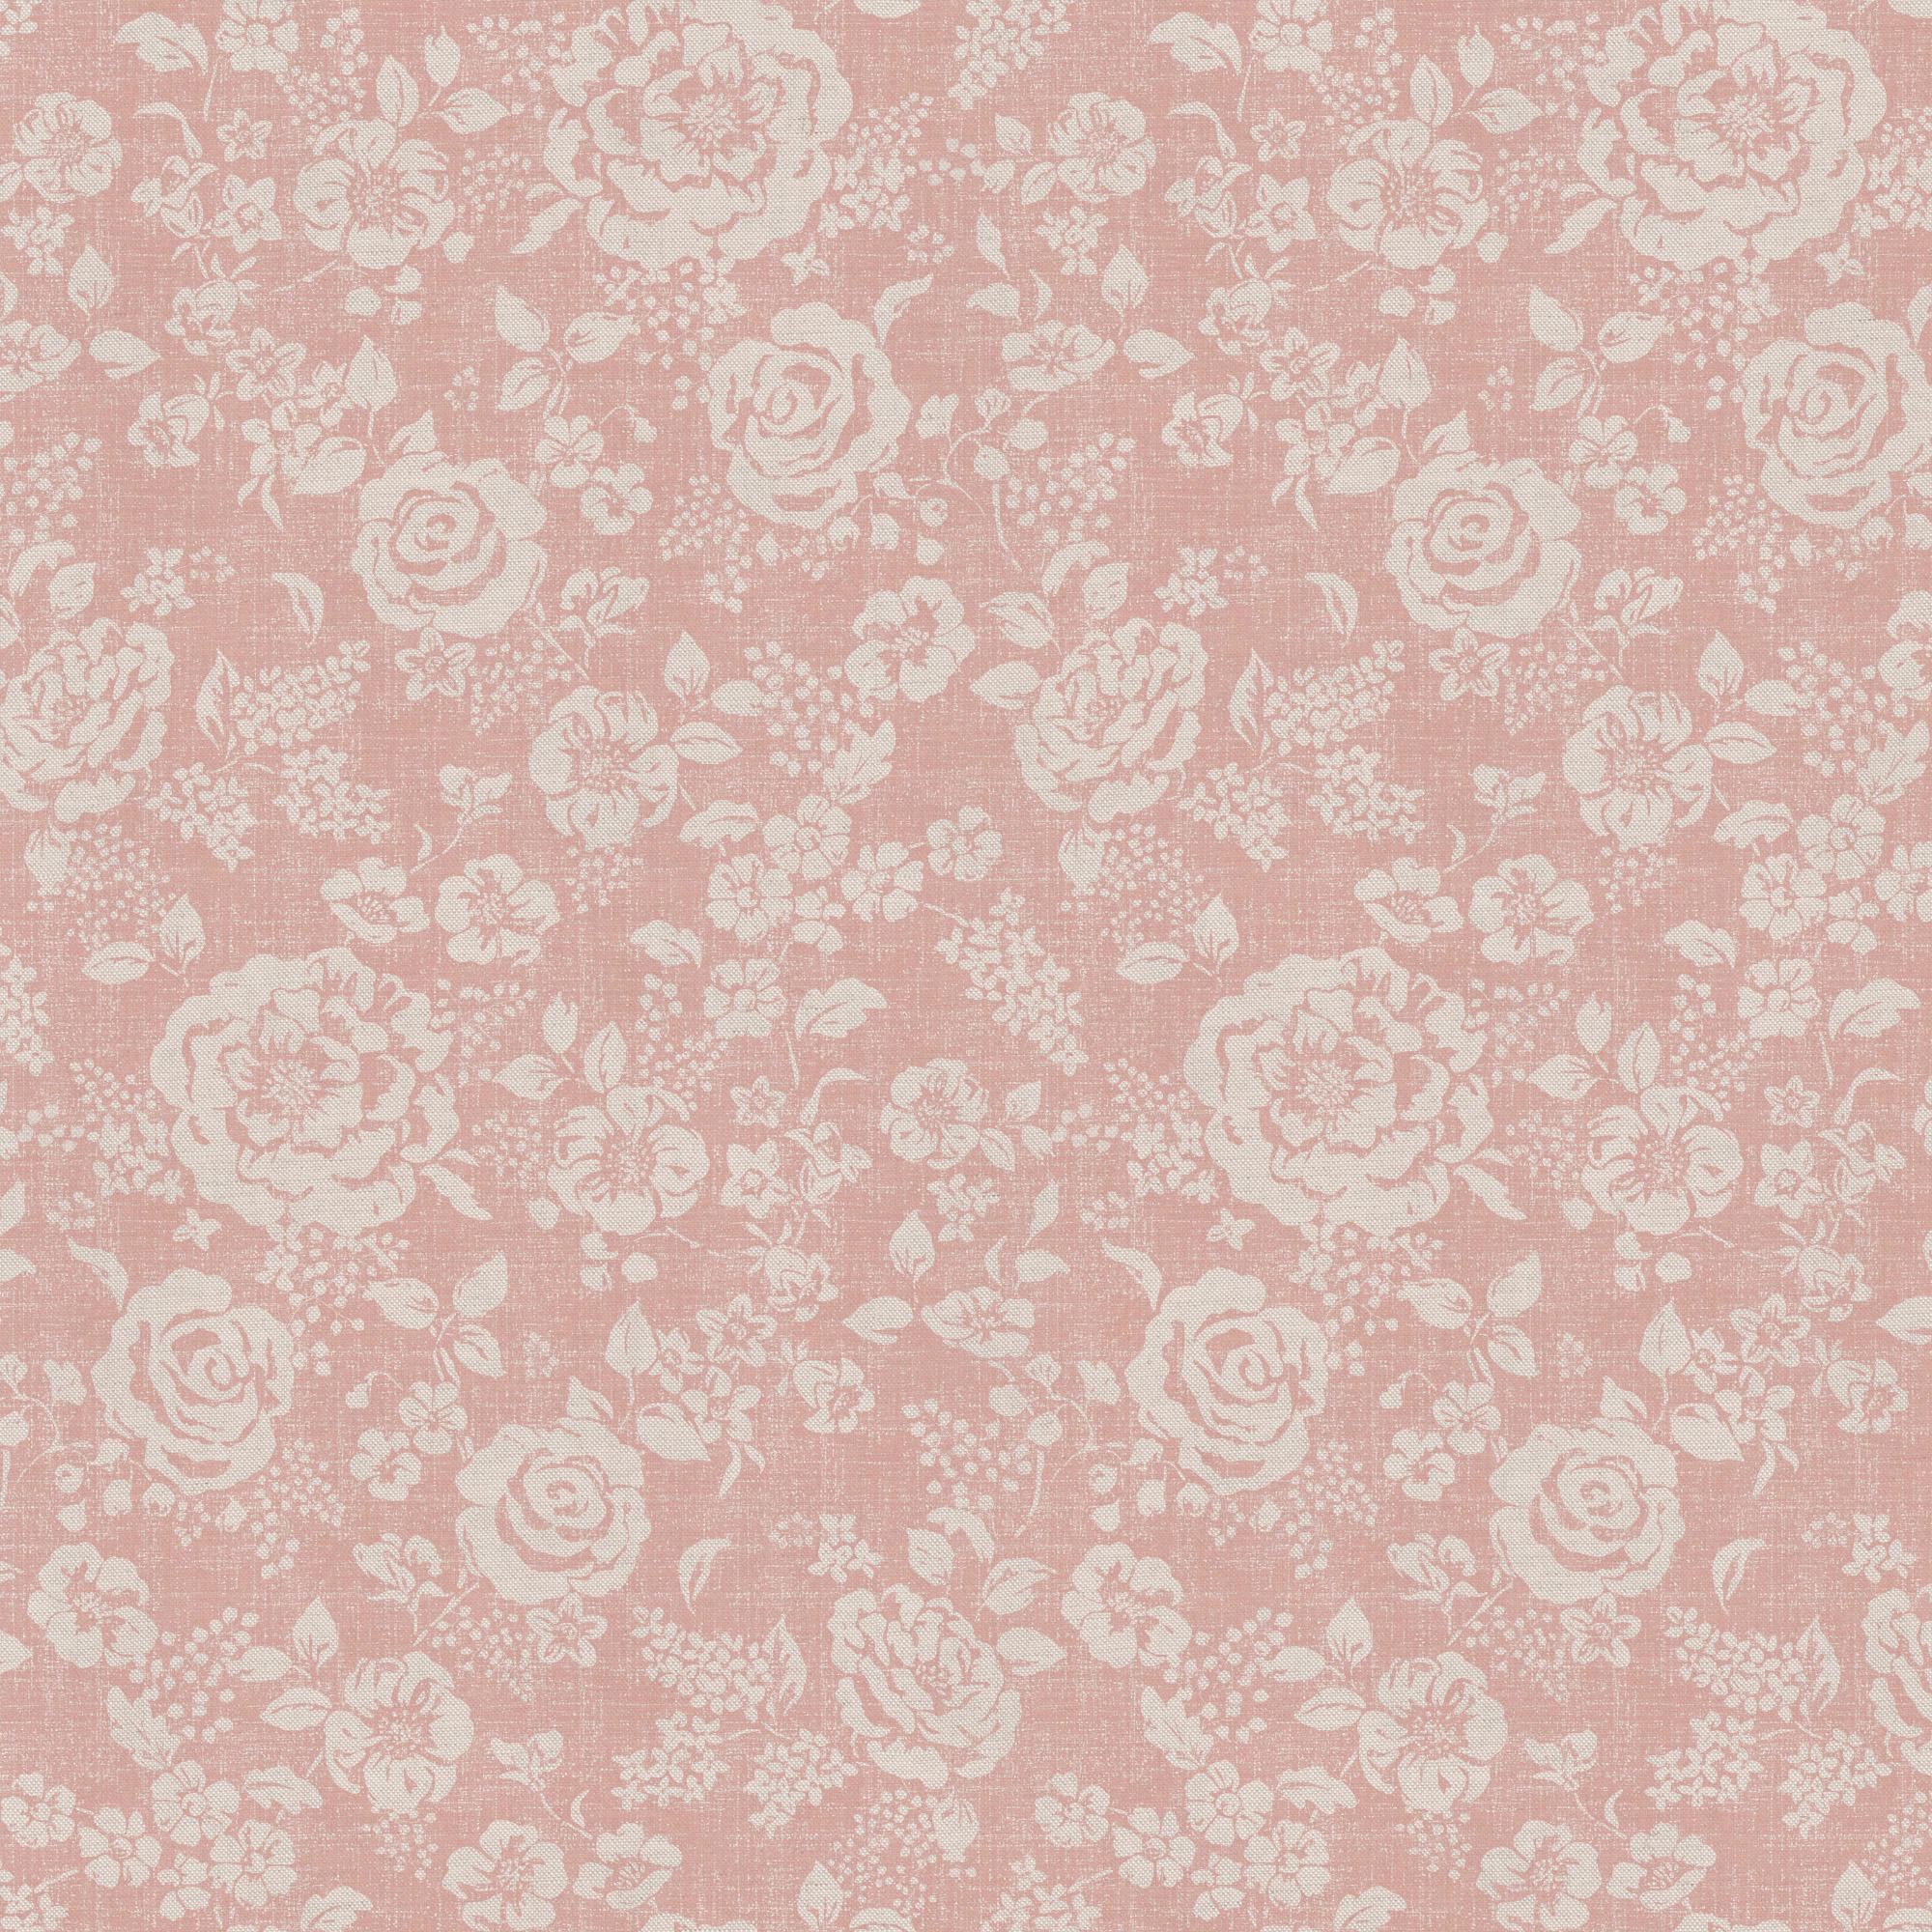 Rose Garden Pink